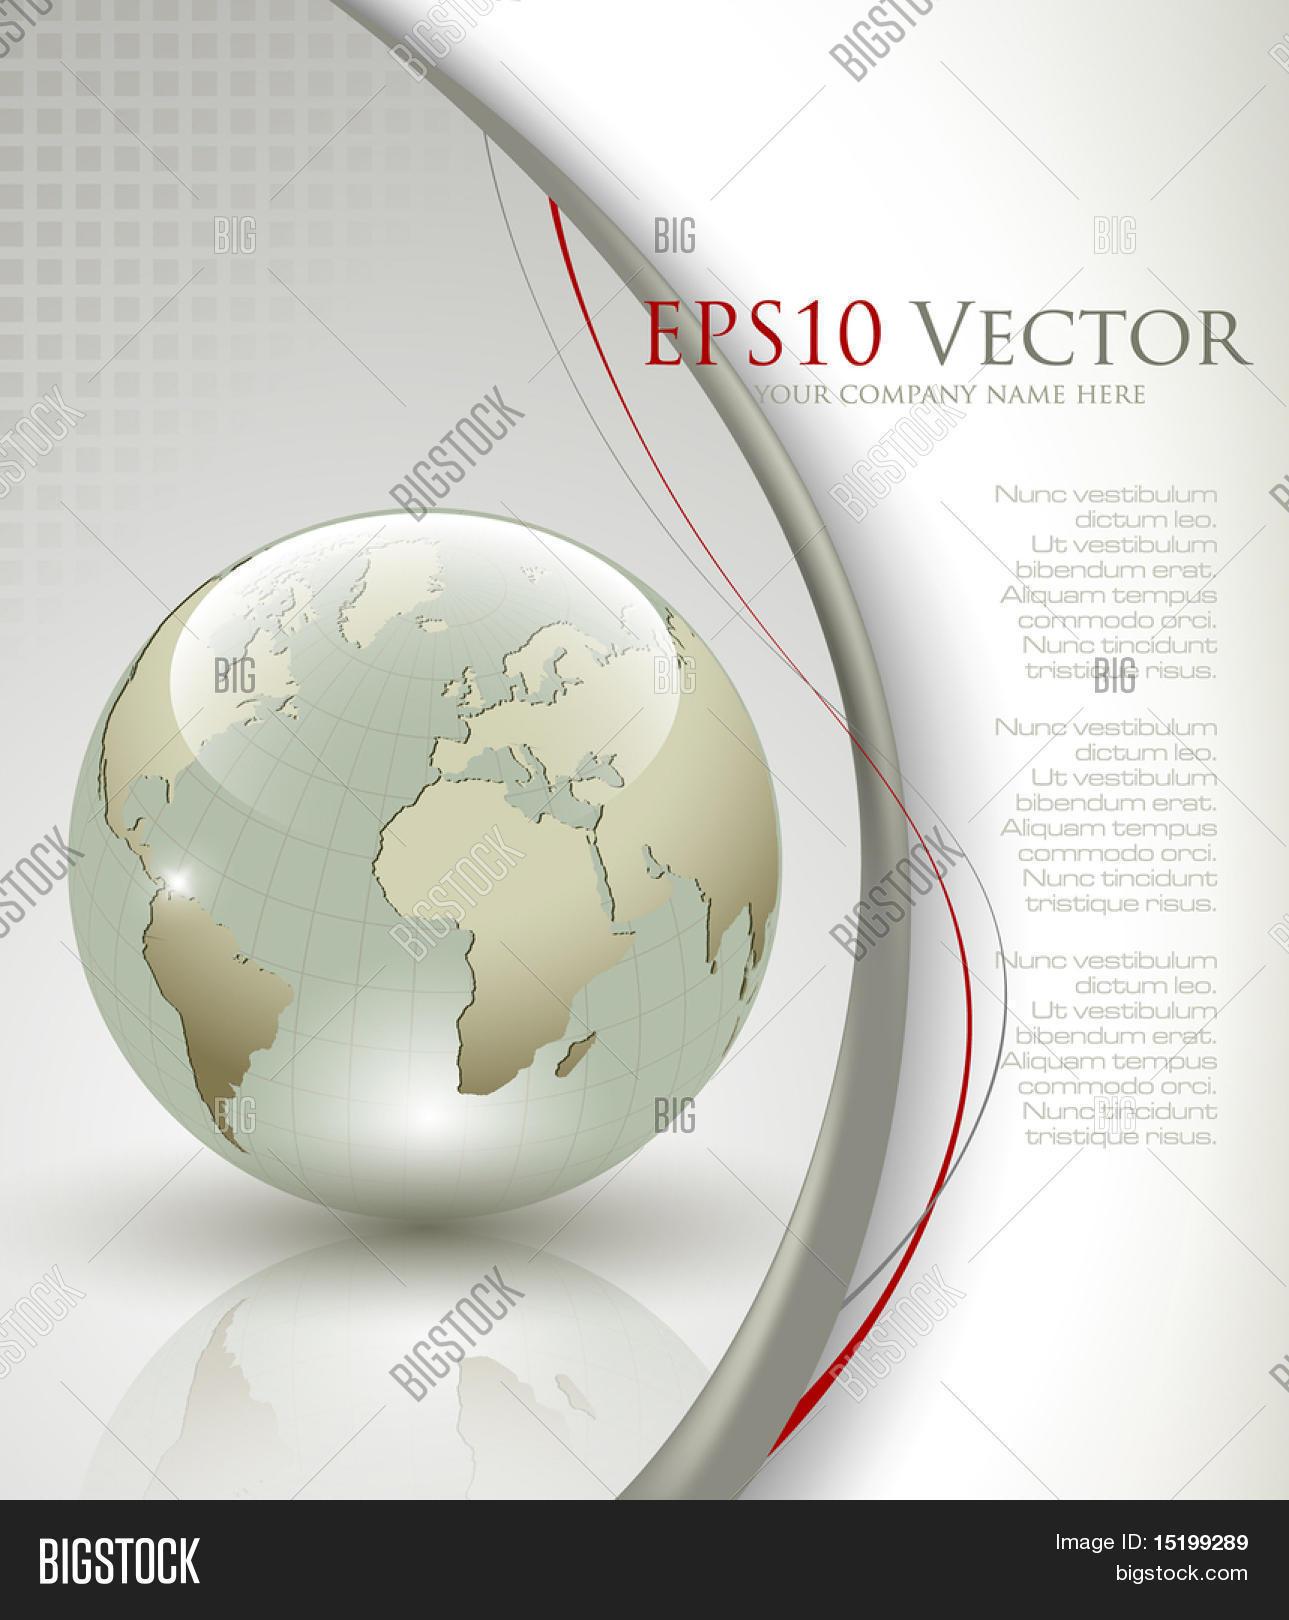 Business elegant abstract background - vector illustration